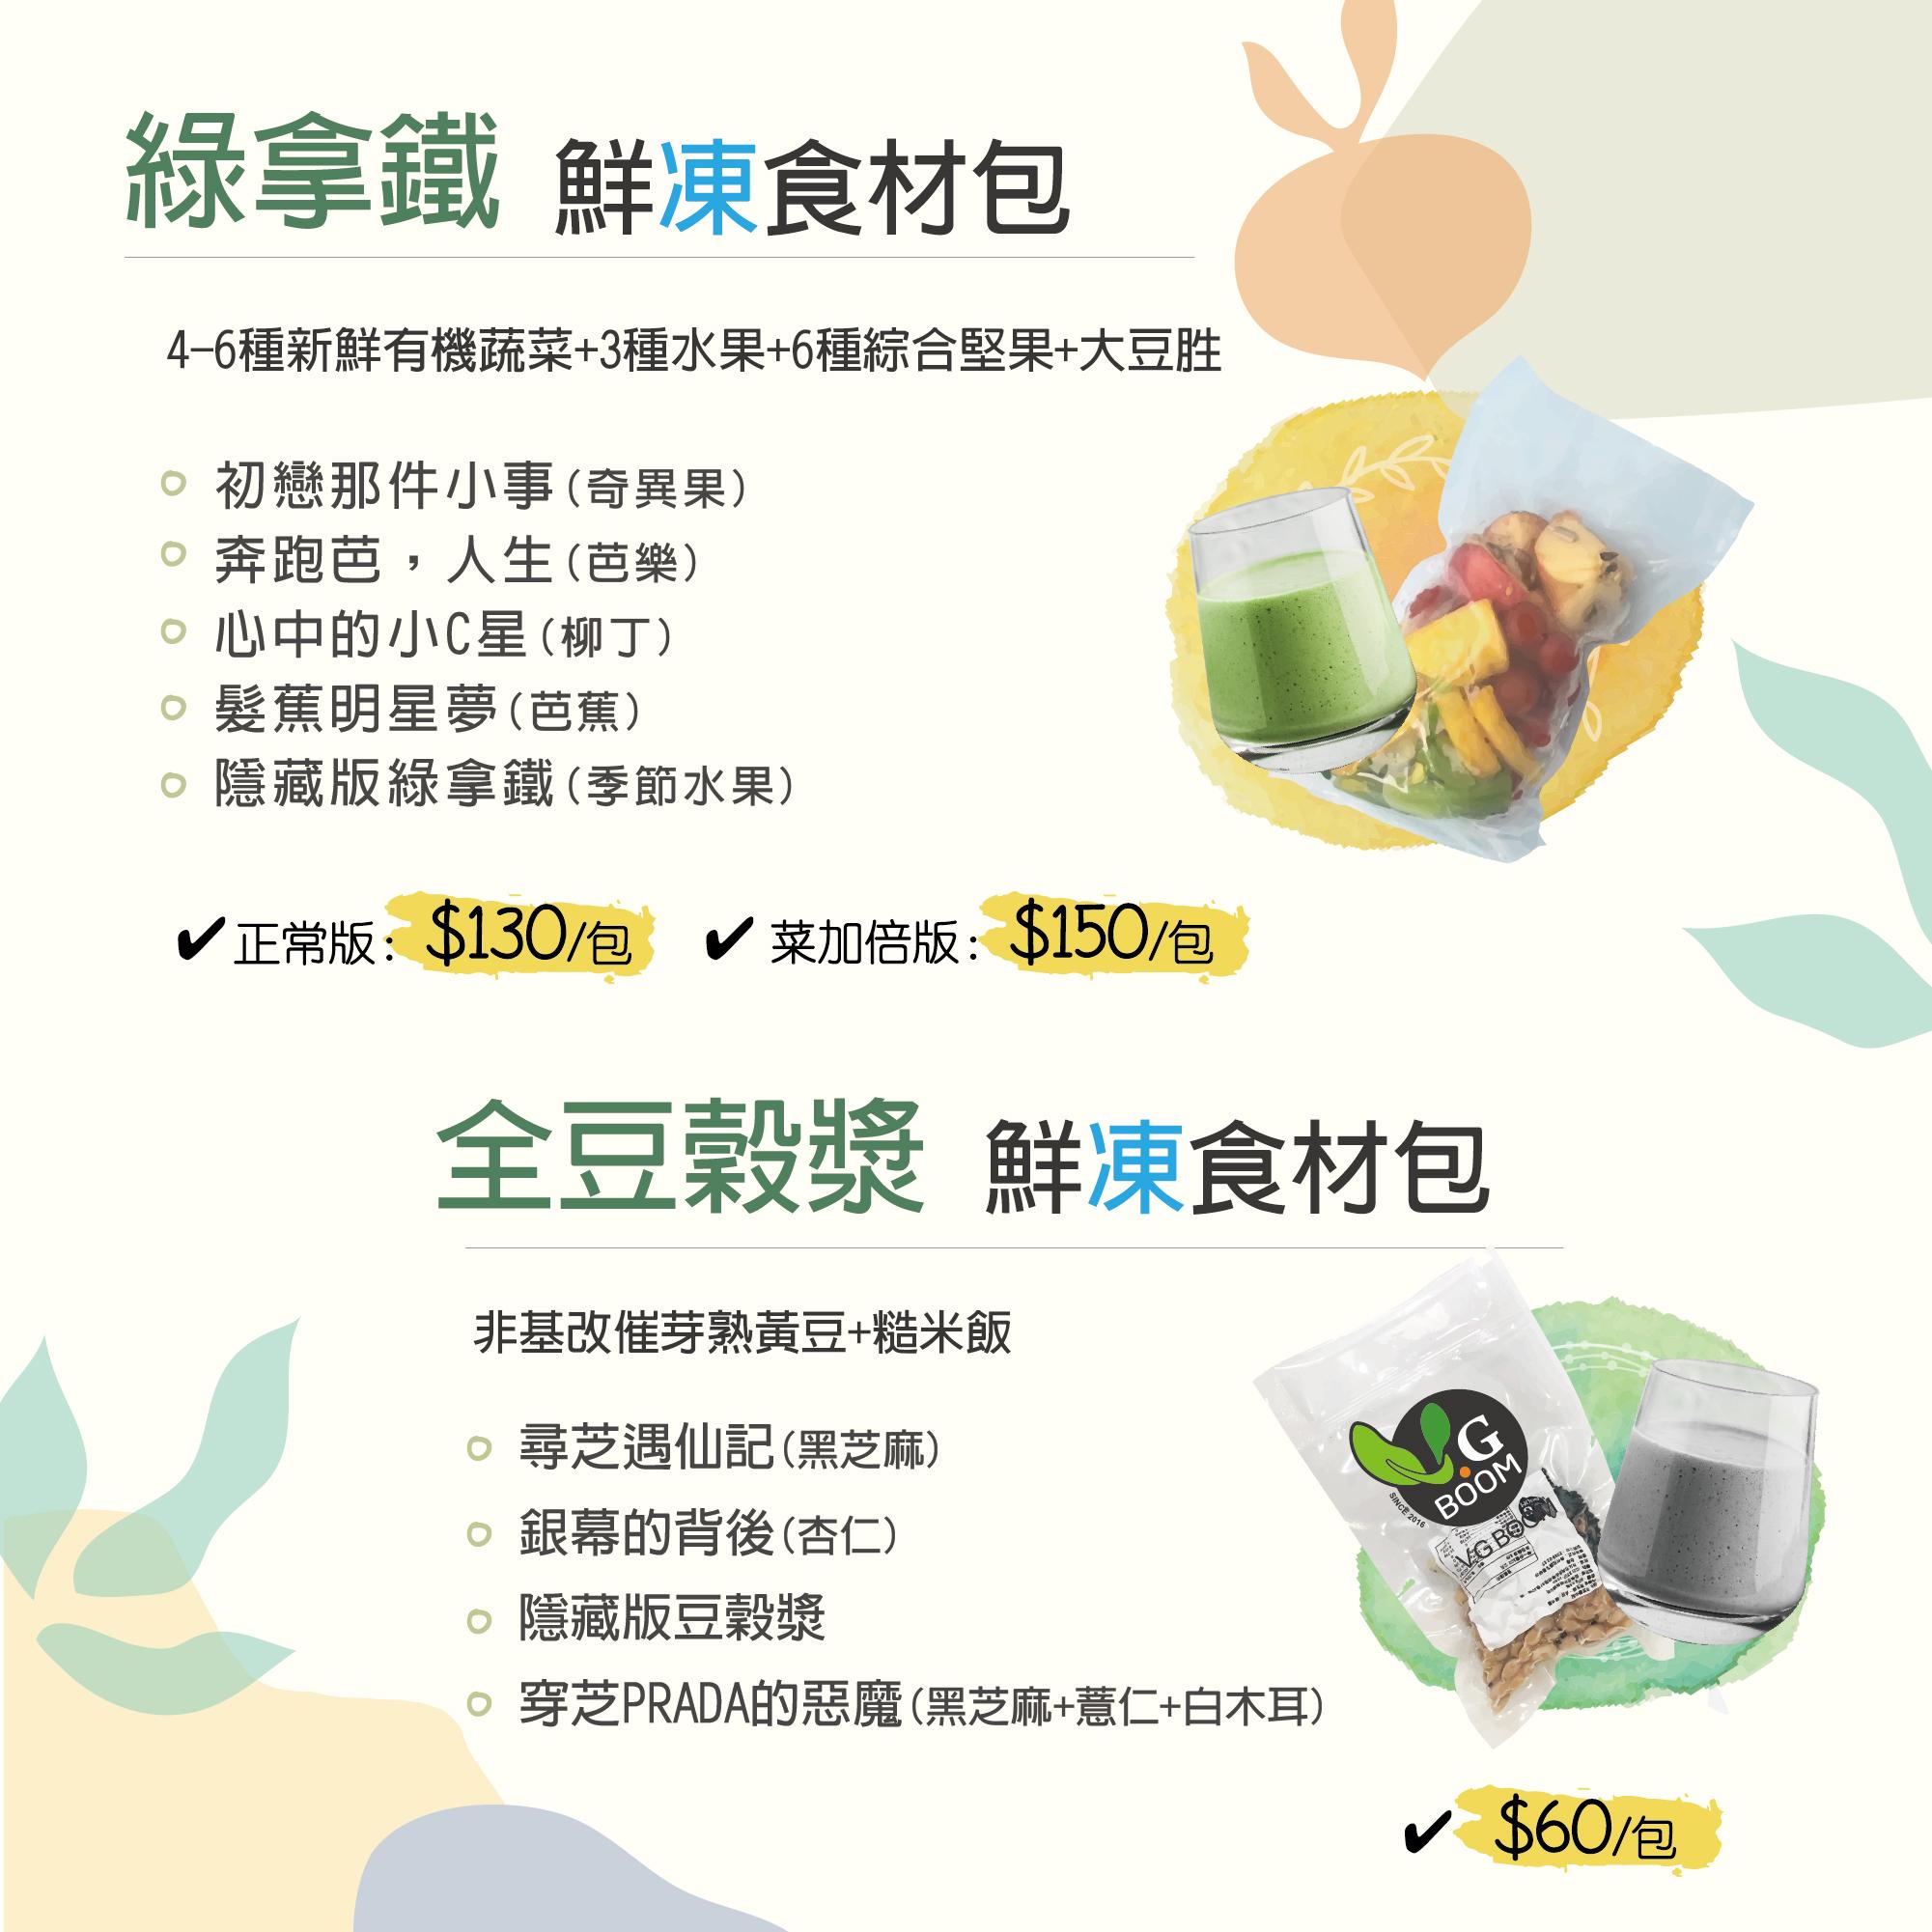 news_green_smoothies_latte_VGBOOM_vitamix_tnc_S30_dietu_healthy_菜加倍版_新登場-鮮凍包-綠拿鐵